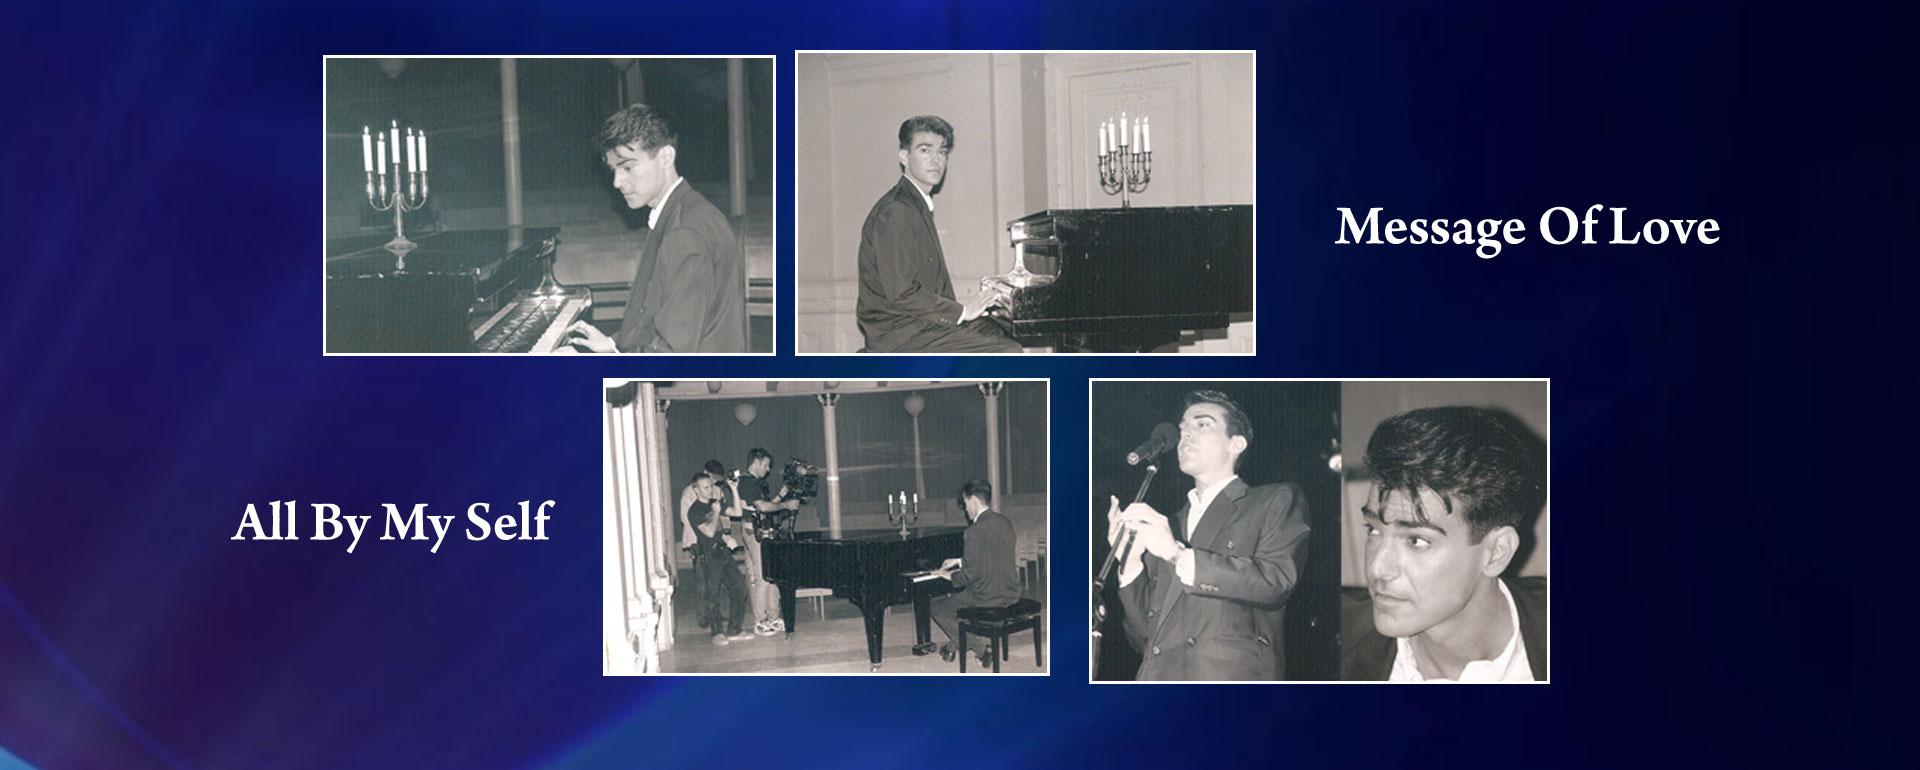 Don Bennechi History Music Video Recording 1997